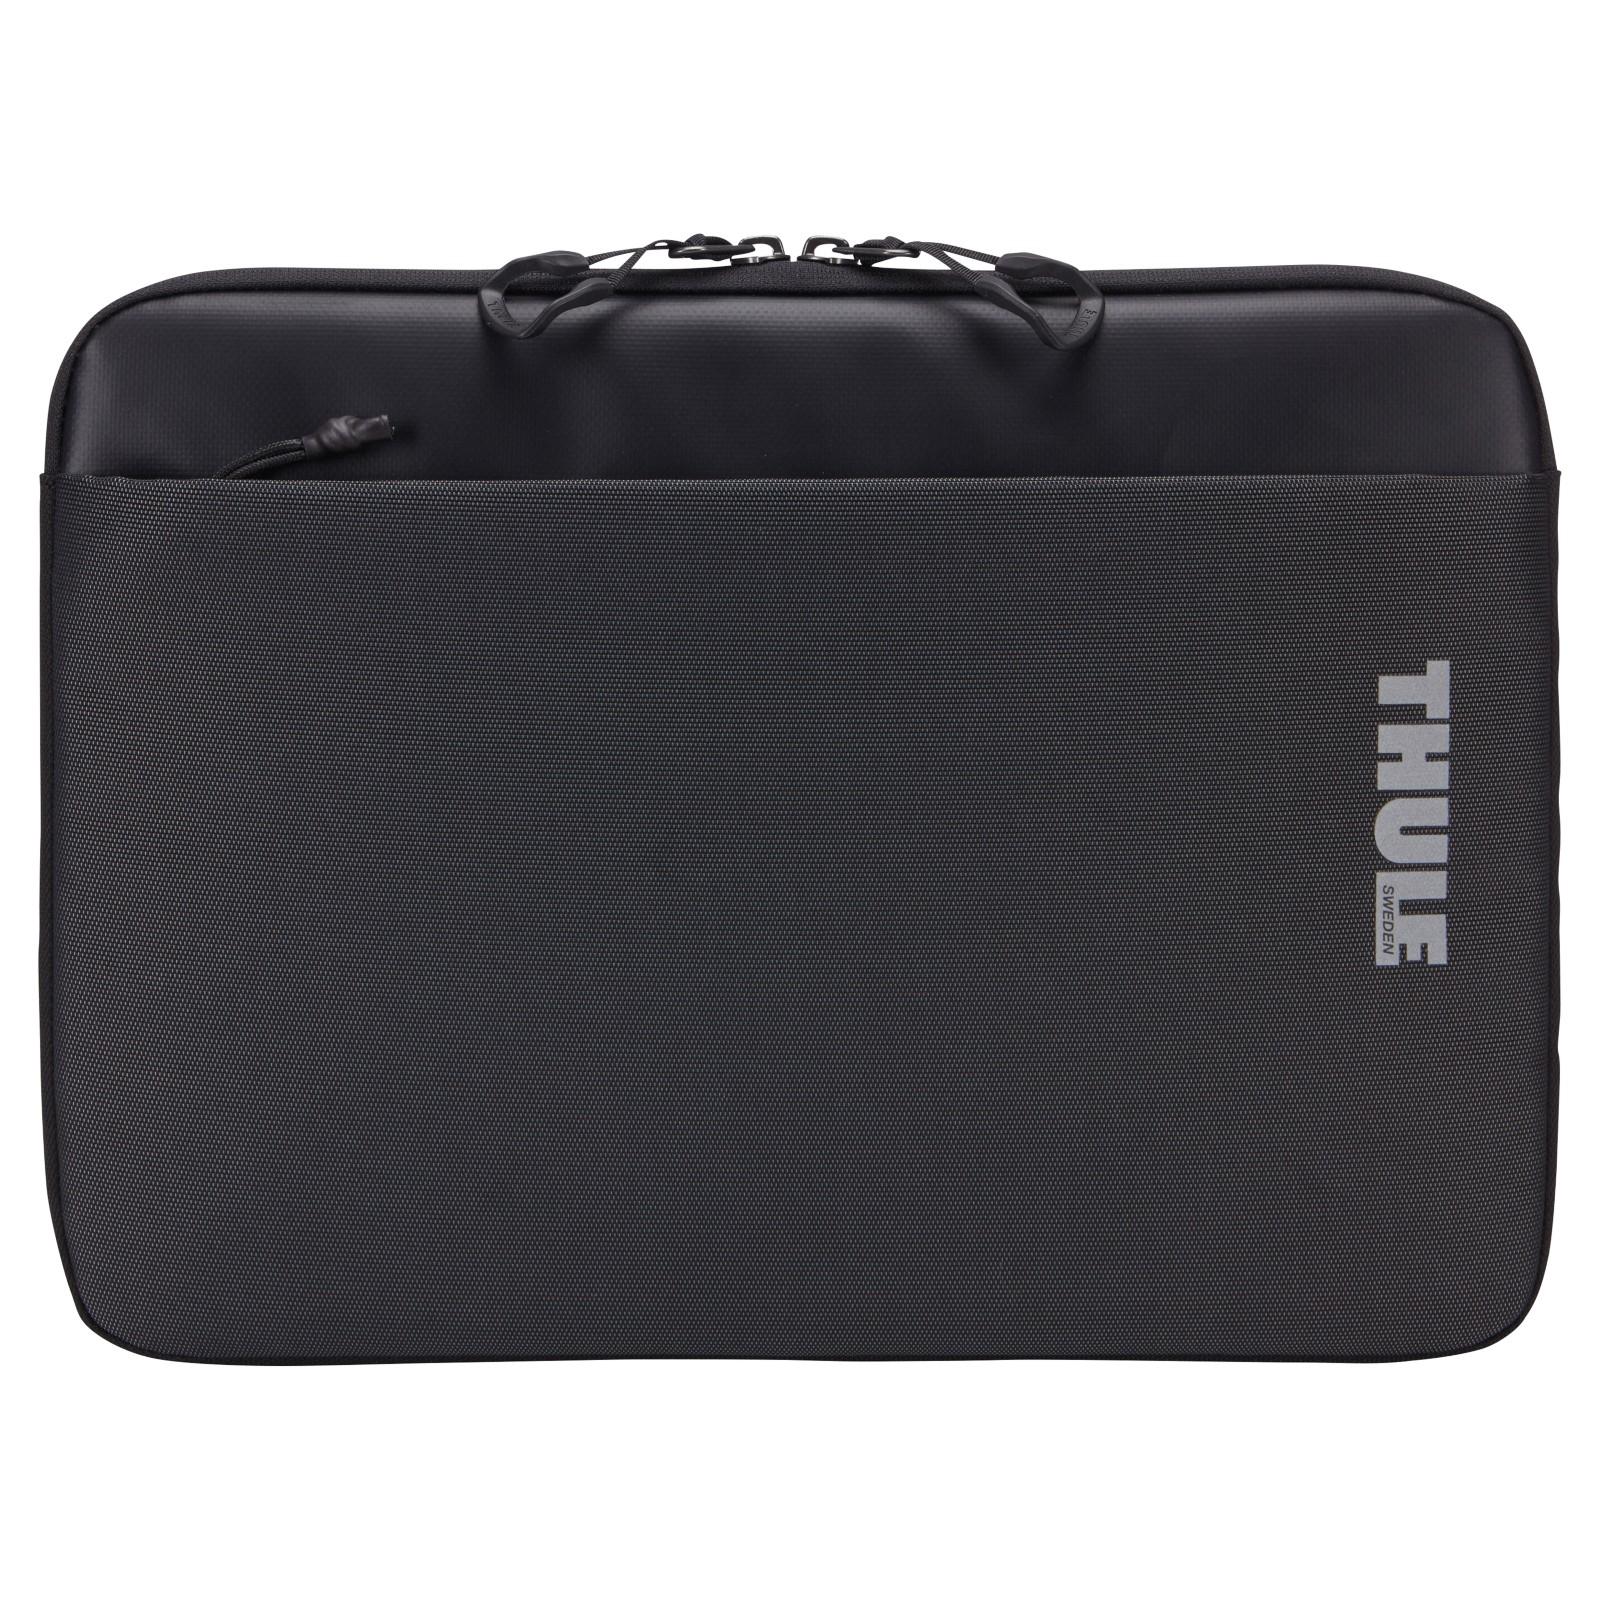 "Thule Subterra Sleeve for 13"" MacBooks"